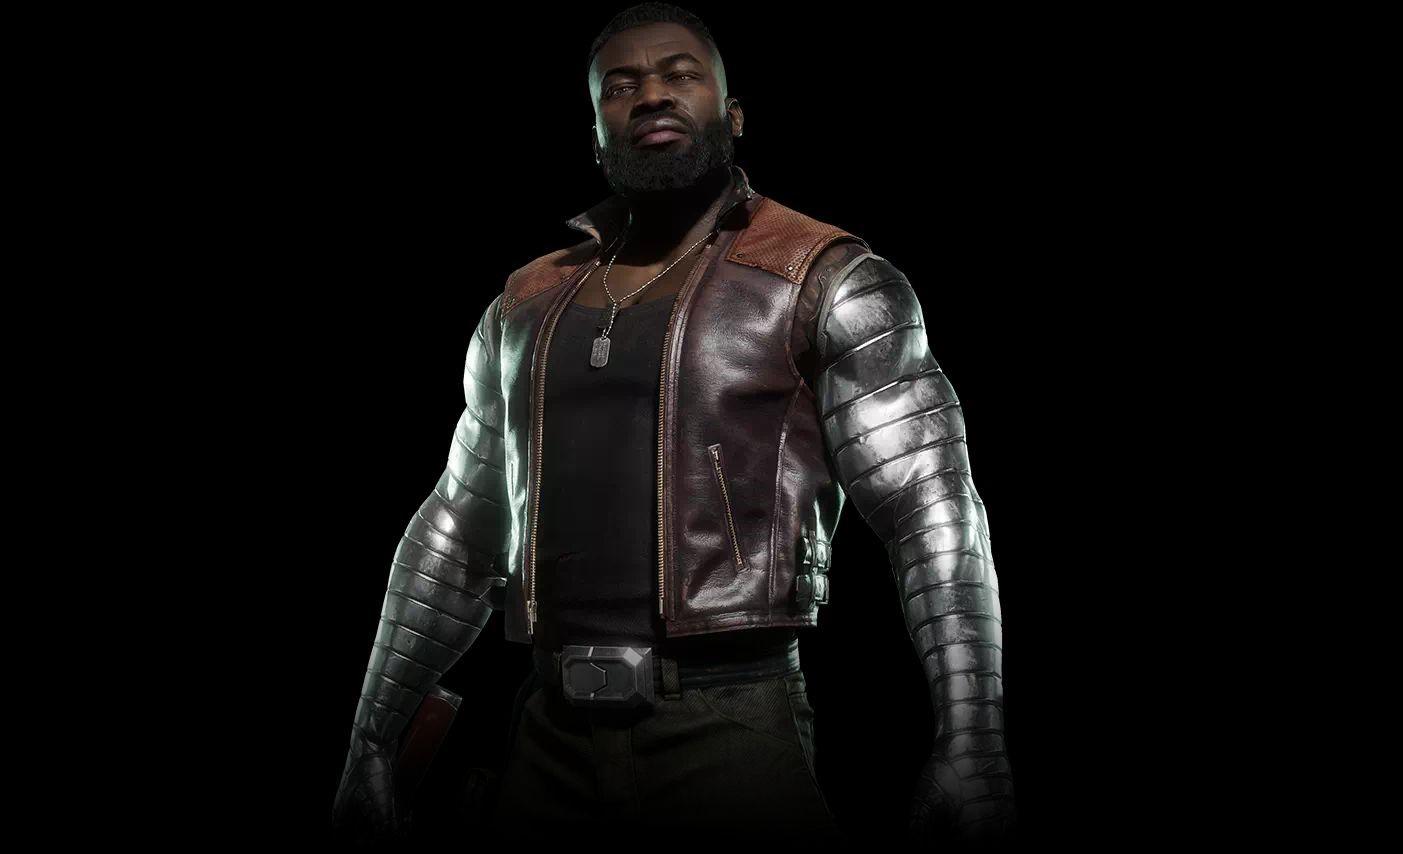 The Mortal Kombat movie has cast its Liu Kang, Mileena, Jax, and others - VG247